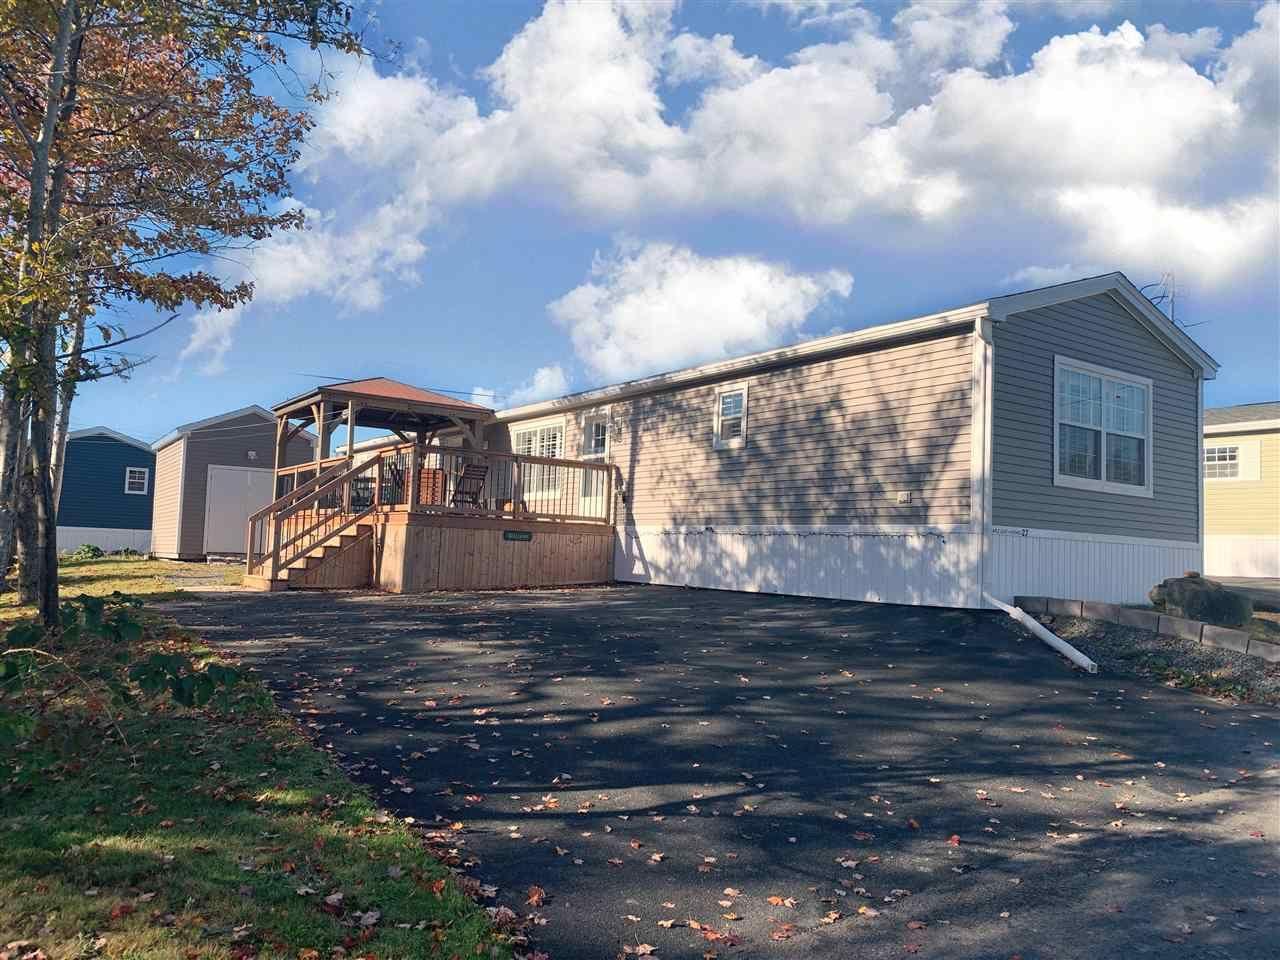 Main Photo: 27 Fourth Street in Lucasville: 21-Kingswood, Haliburton Hills, Hammonds Pl. Residential for sale (Halifax-Dartmouth)  : MLS®# 202021617